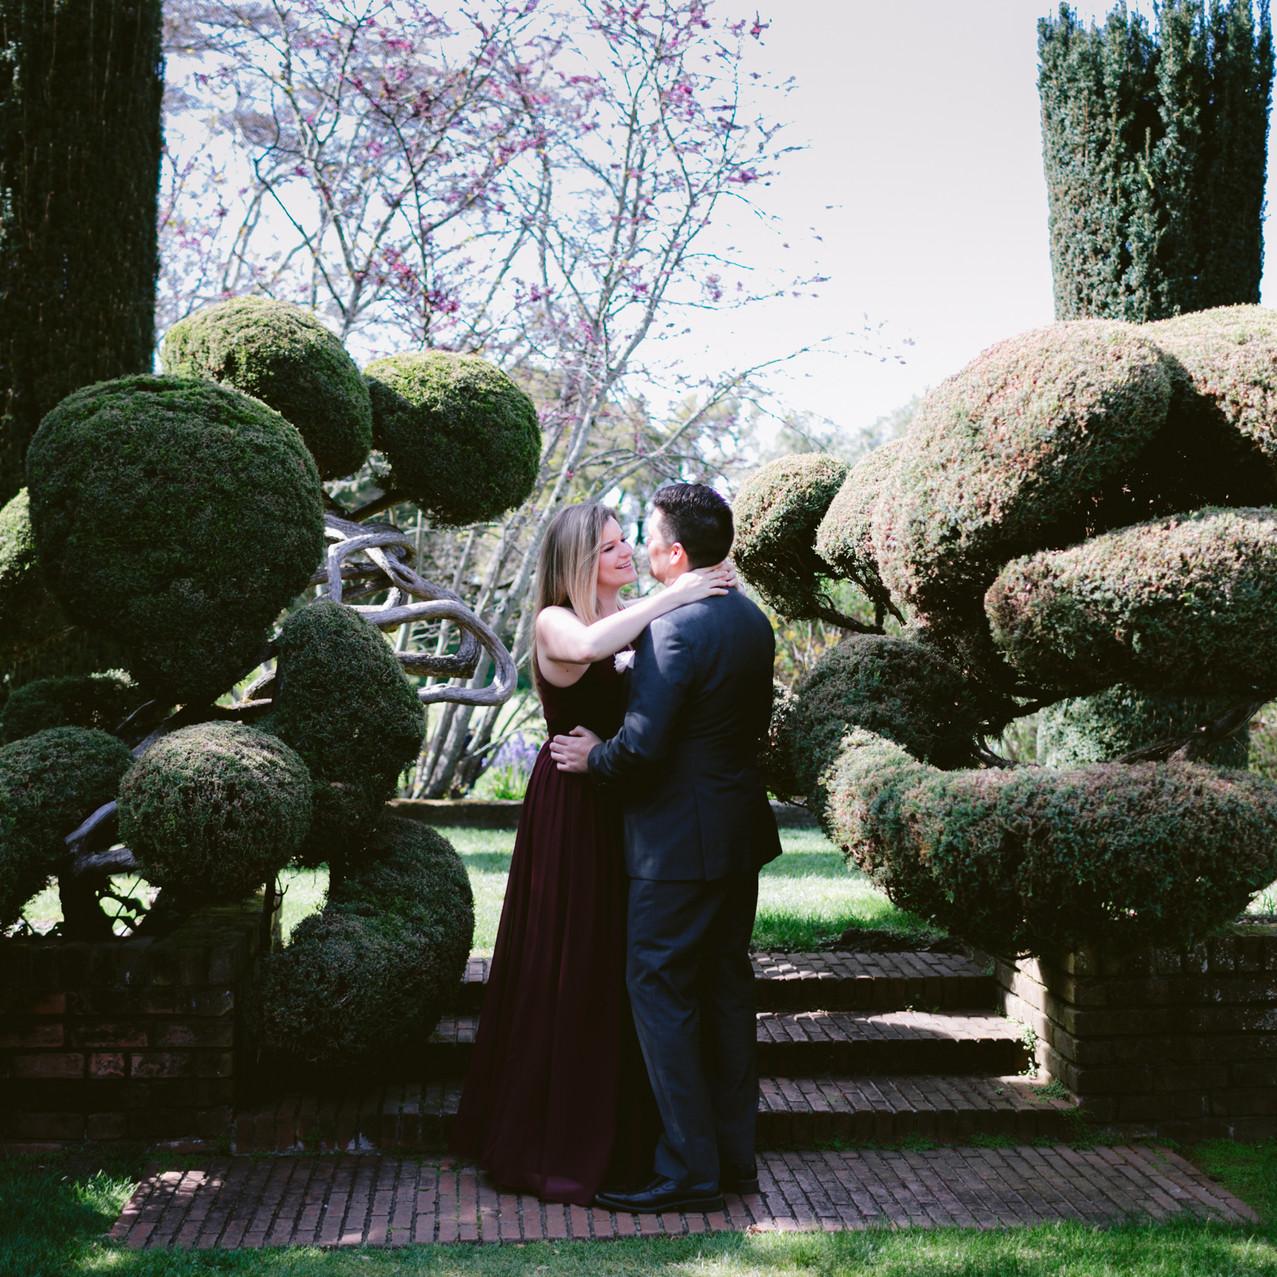 san-francisco-engagement-photography-83.